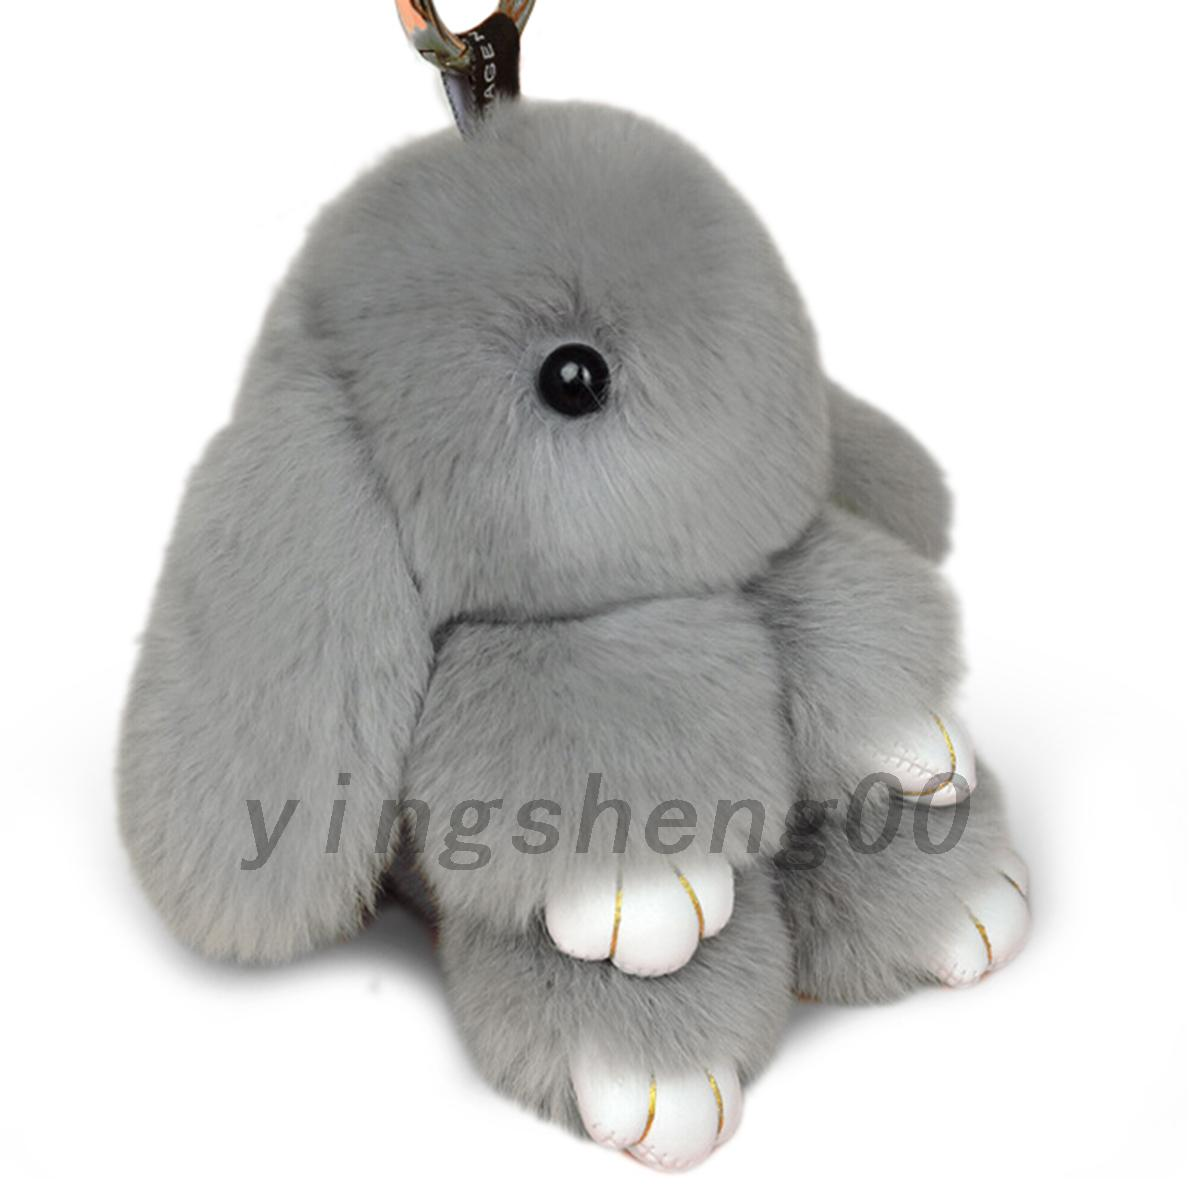 adorable fourrure lapin porte cl sac breloque pendentif. Black Bedroom Furniture Sets. Home Design Ideas